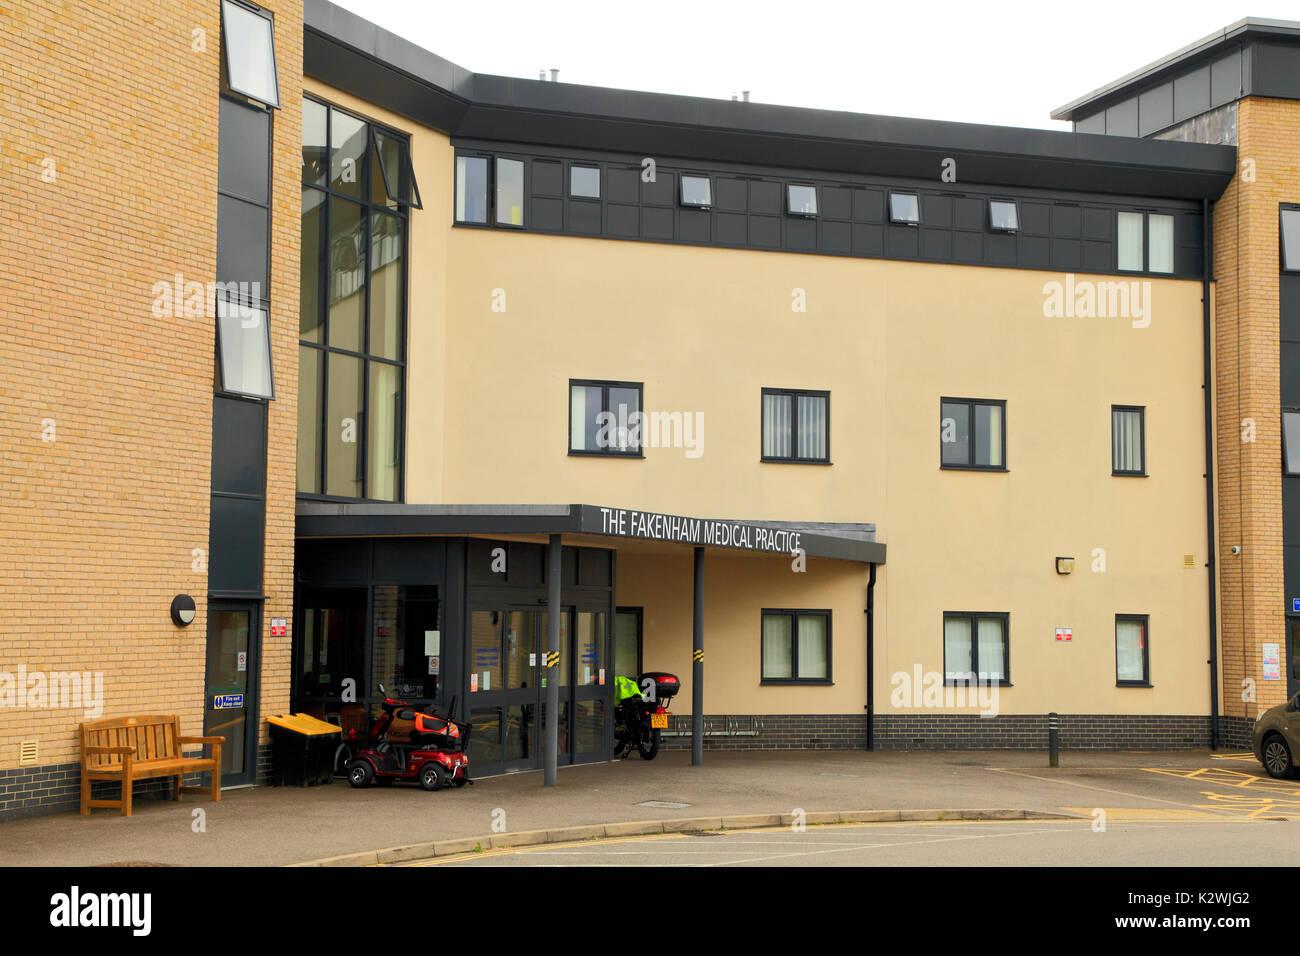 Fakenham pratique médicale, médecin, Médecins, Chirurgie Fakenham, Norfolk, England, UK Photo Stock